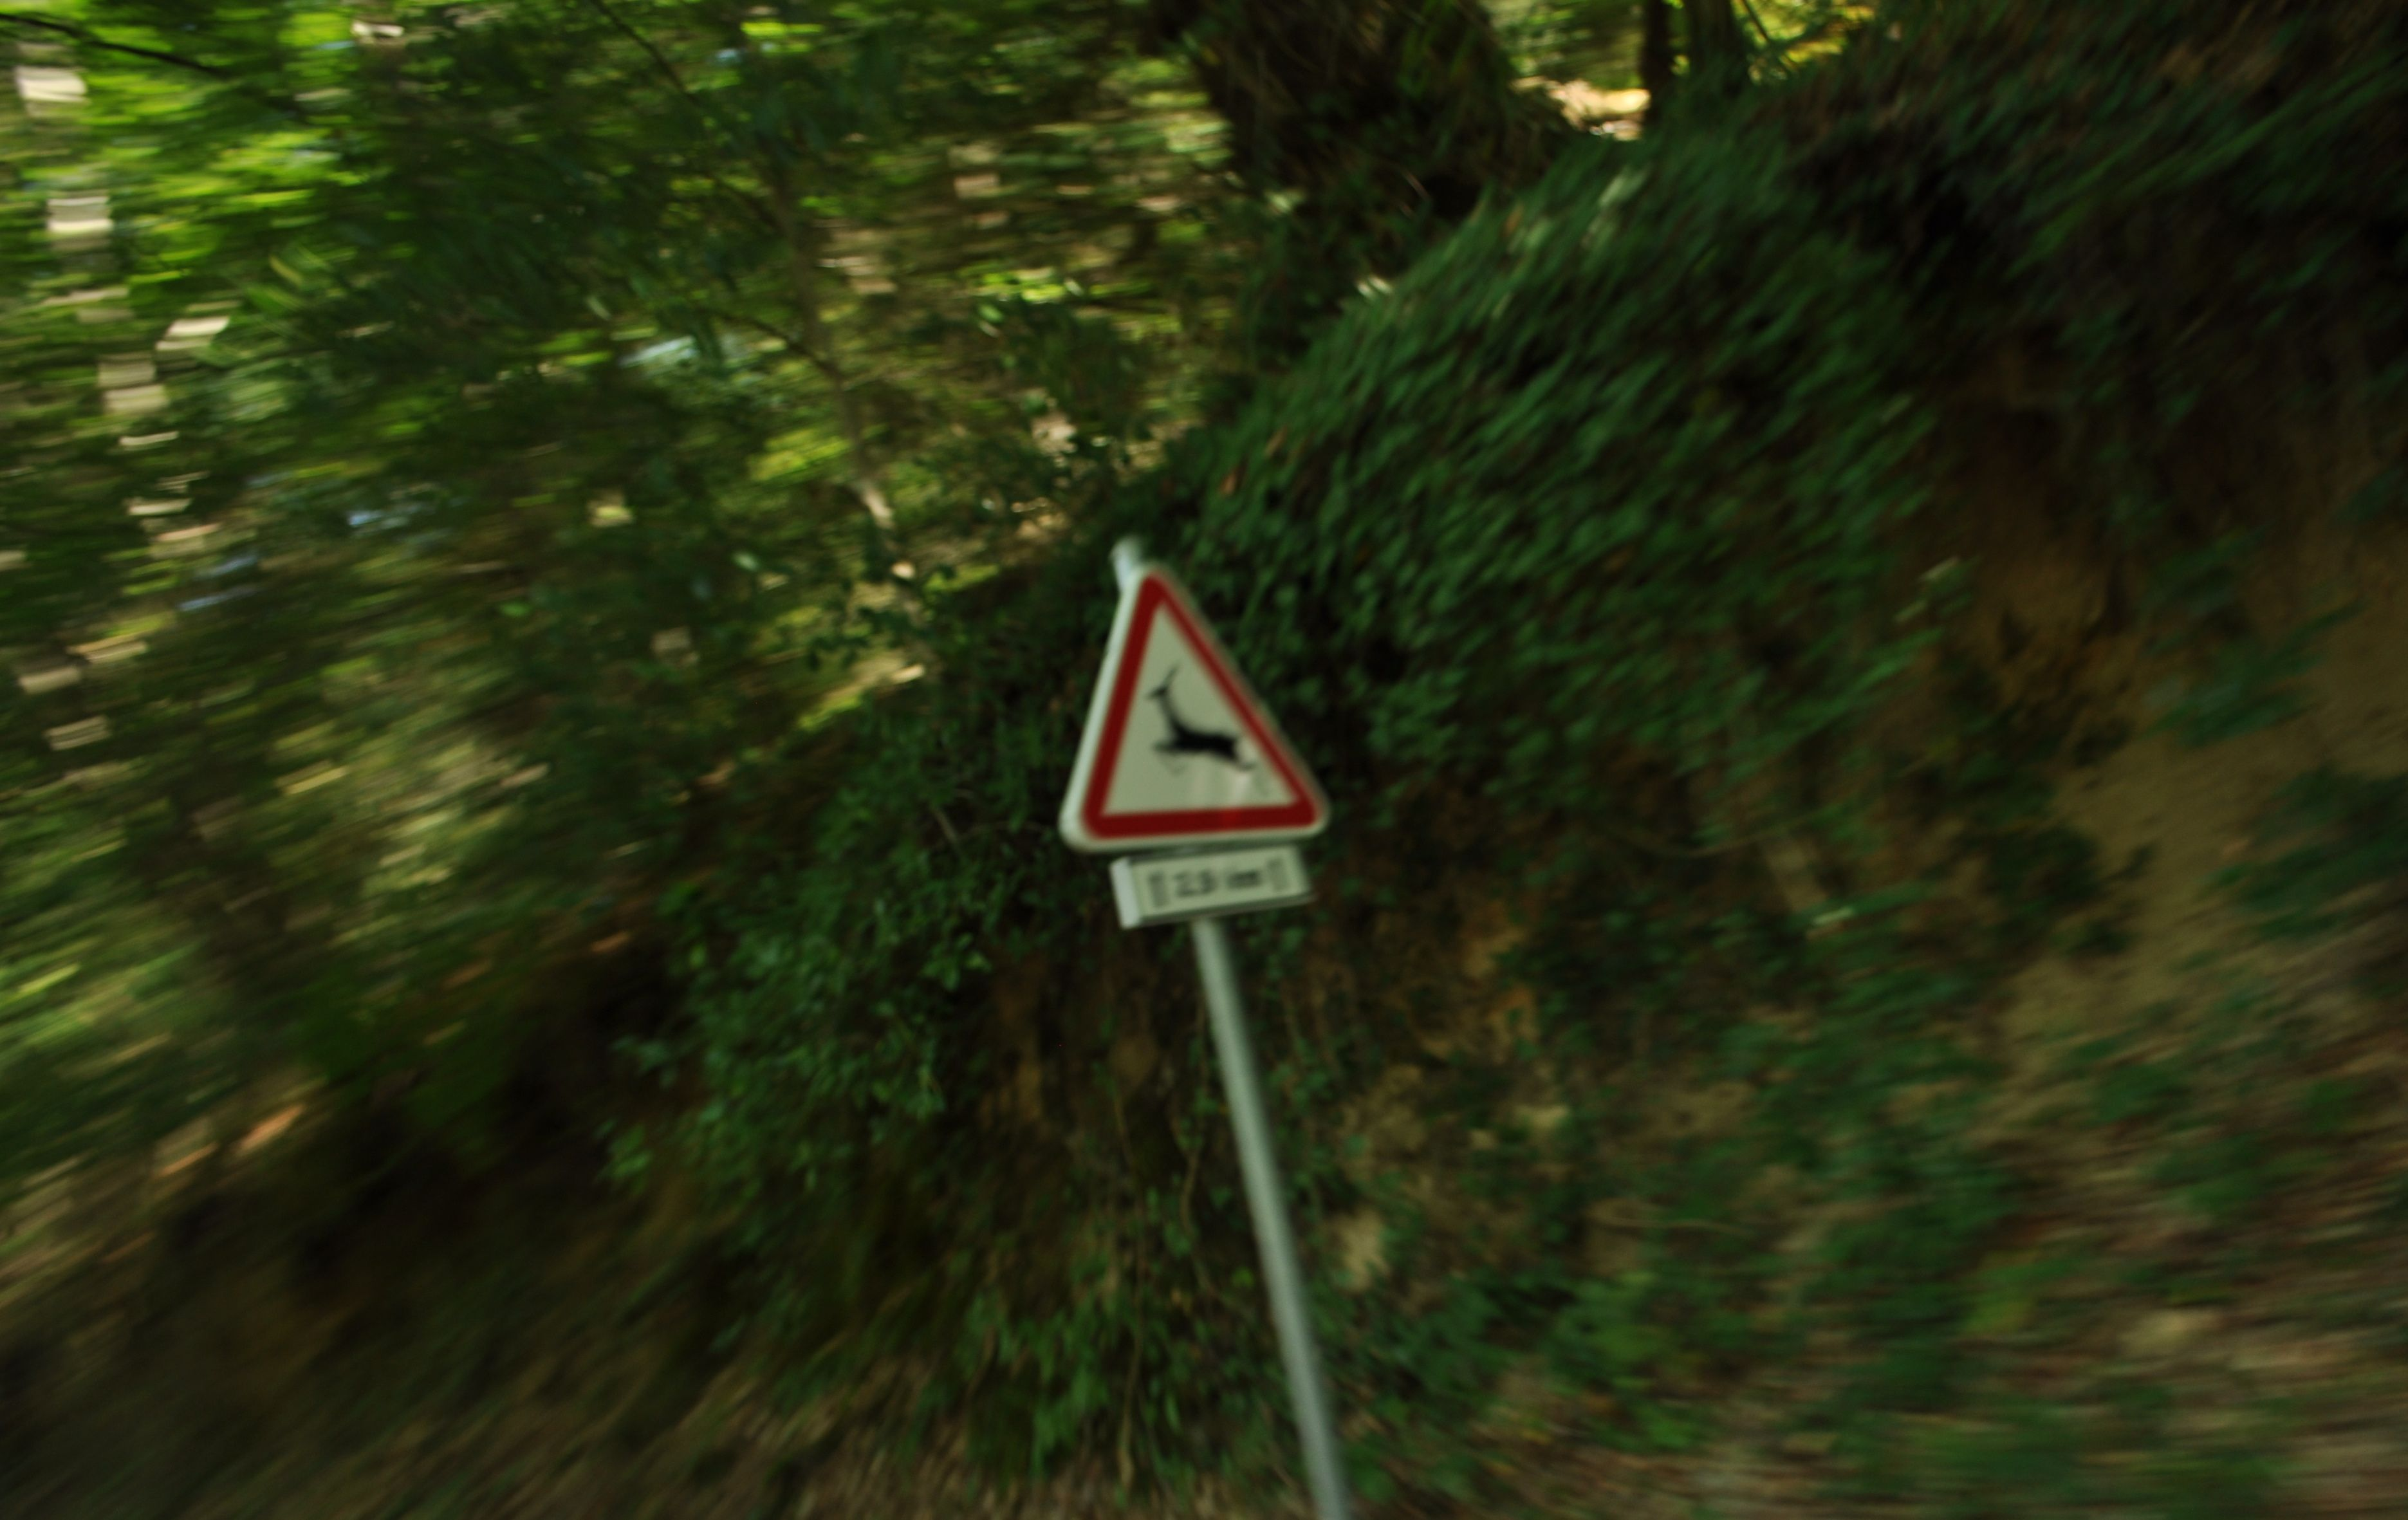 Zona Protegida, Gerês, Portugal